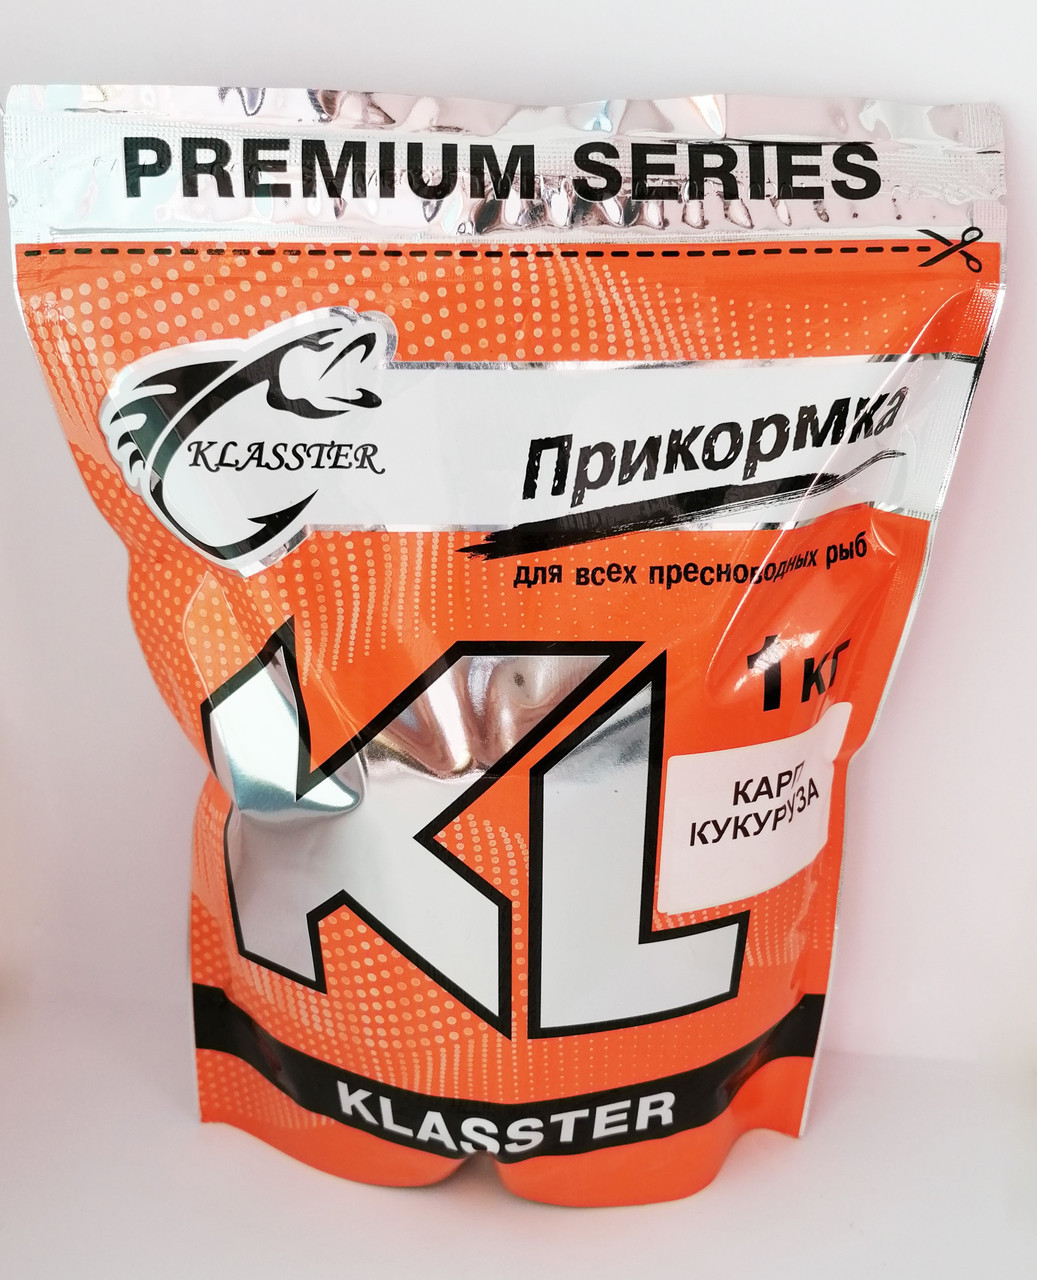 Прикормка Klasster Premium Карп Кукуруза 1кг